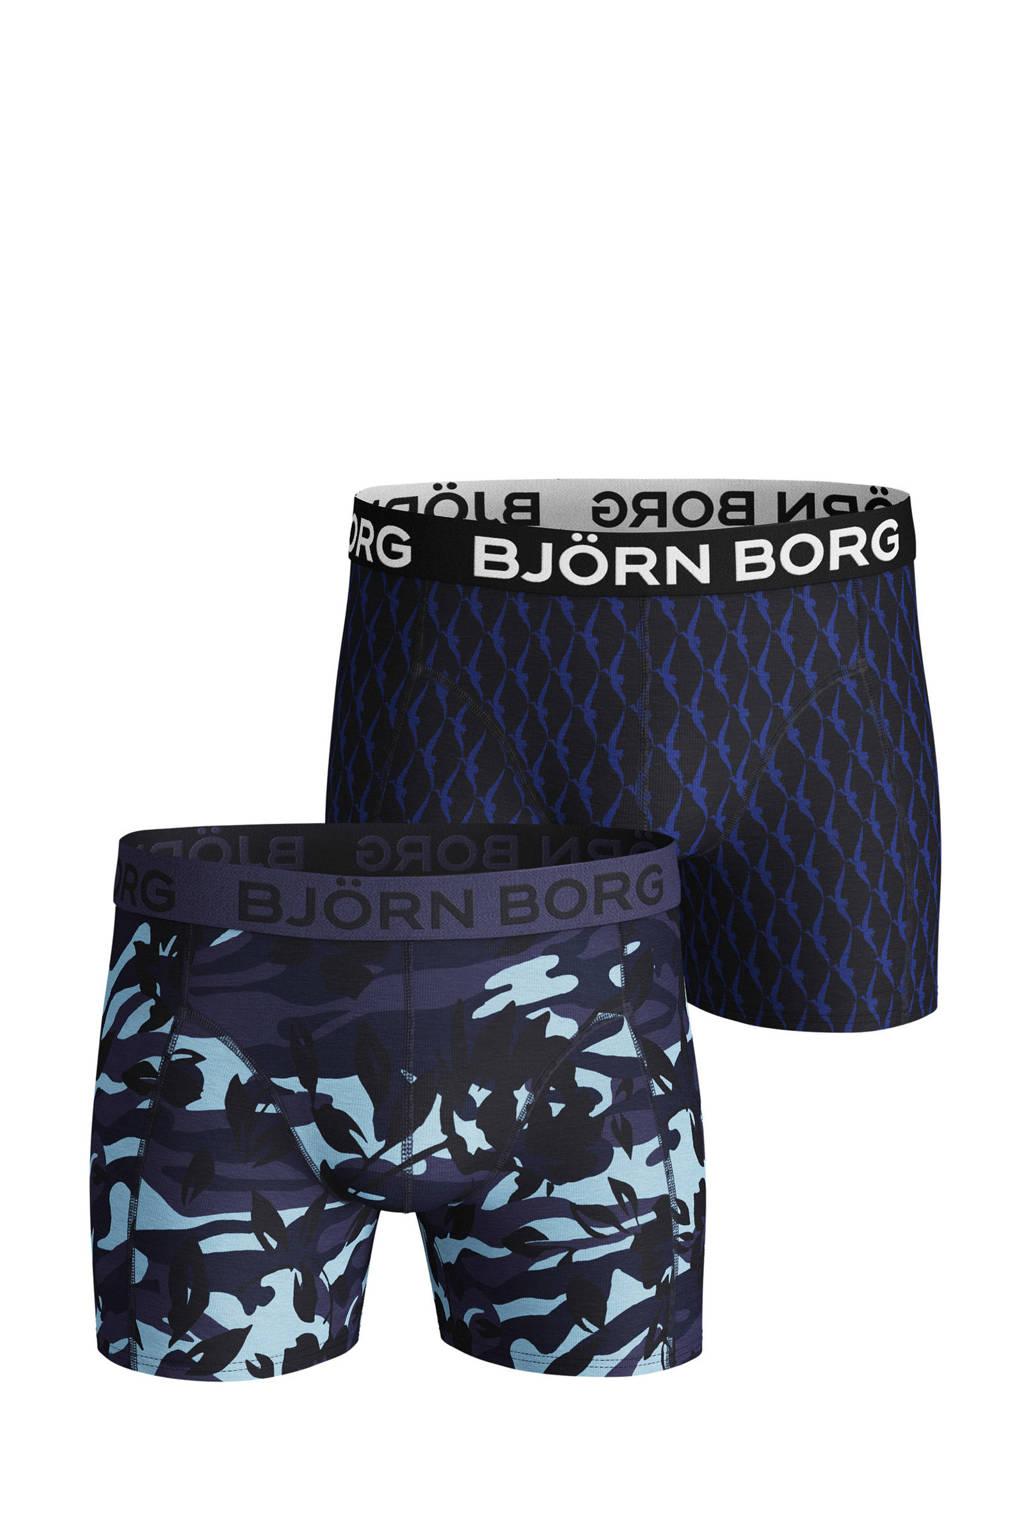 Björn Borg boxershort (set van 2), Donkerblauw